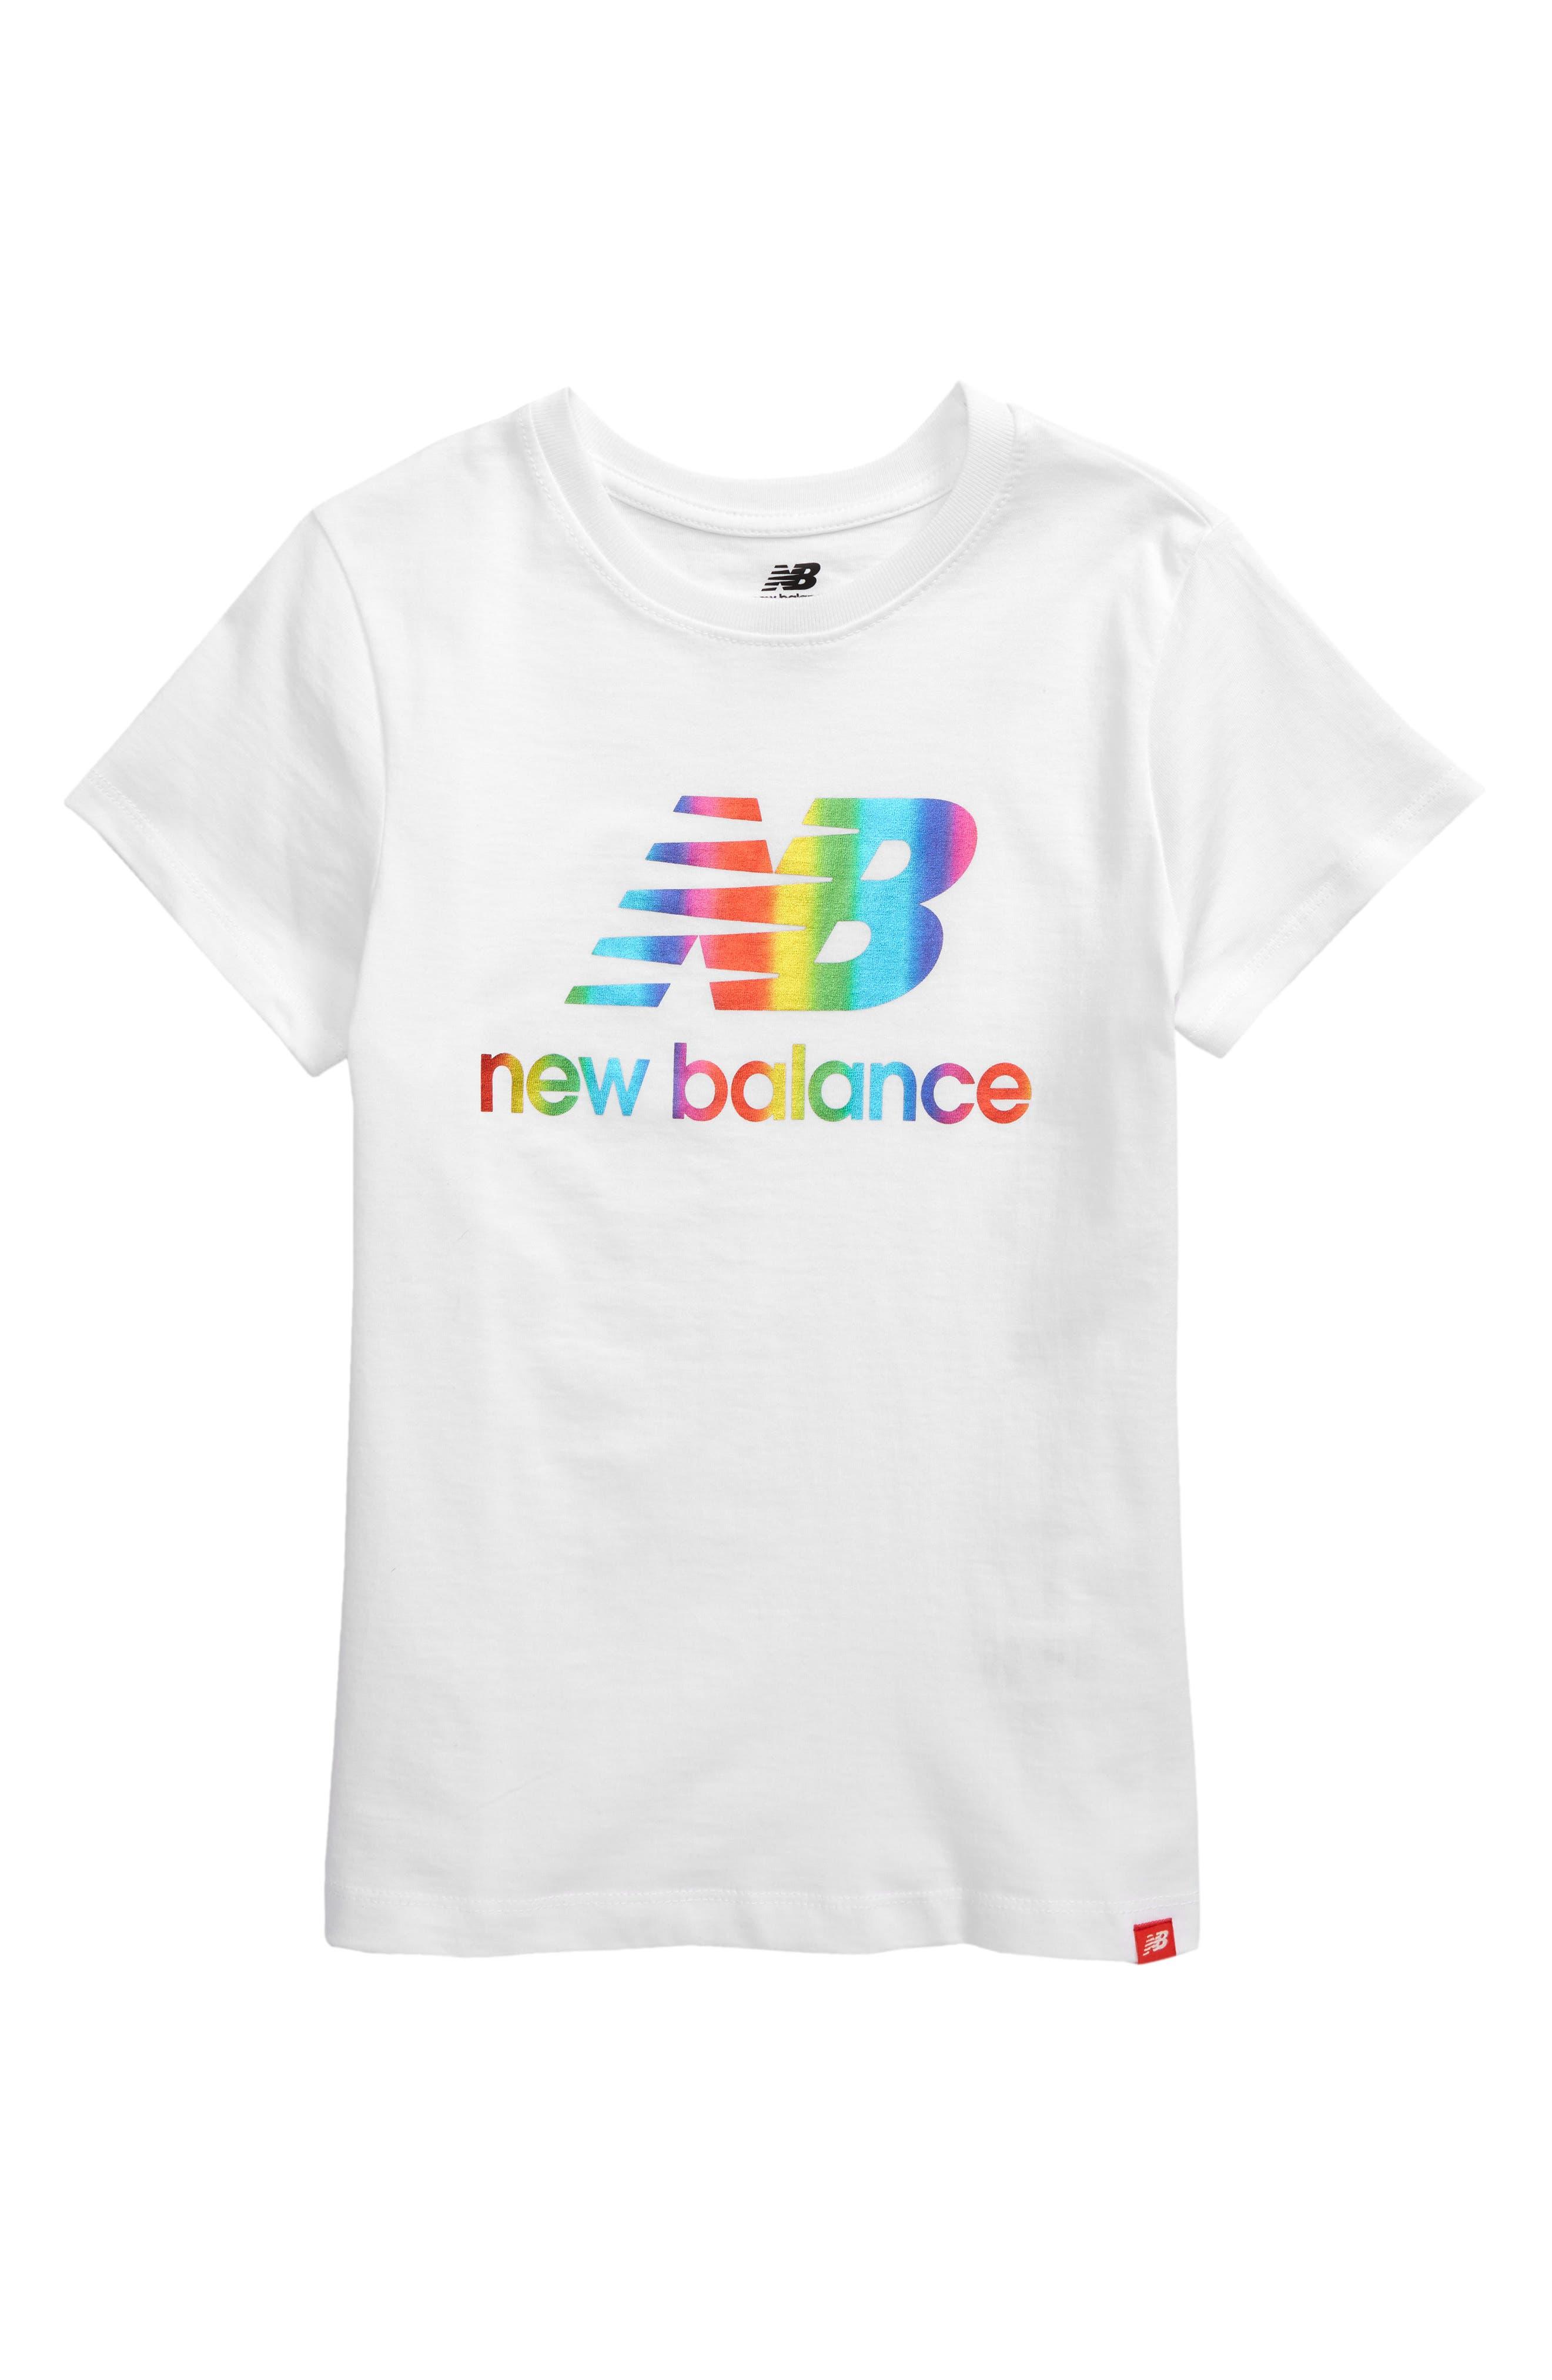 new balance kids clothes